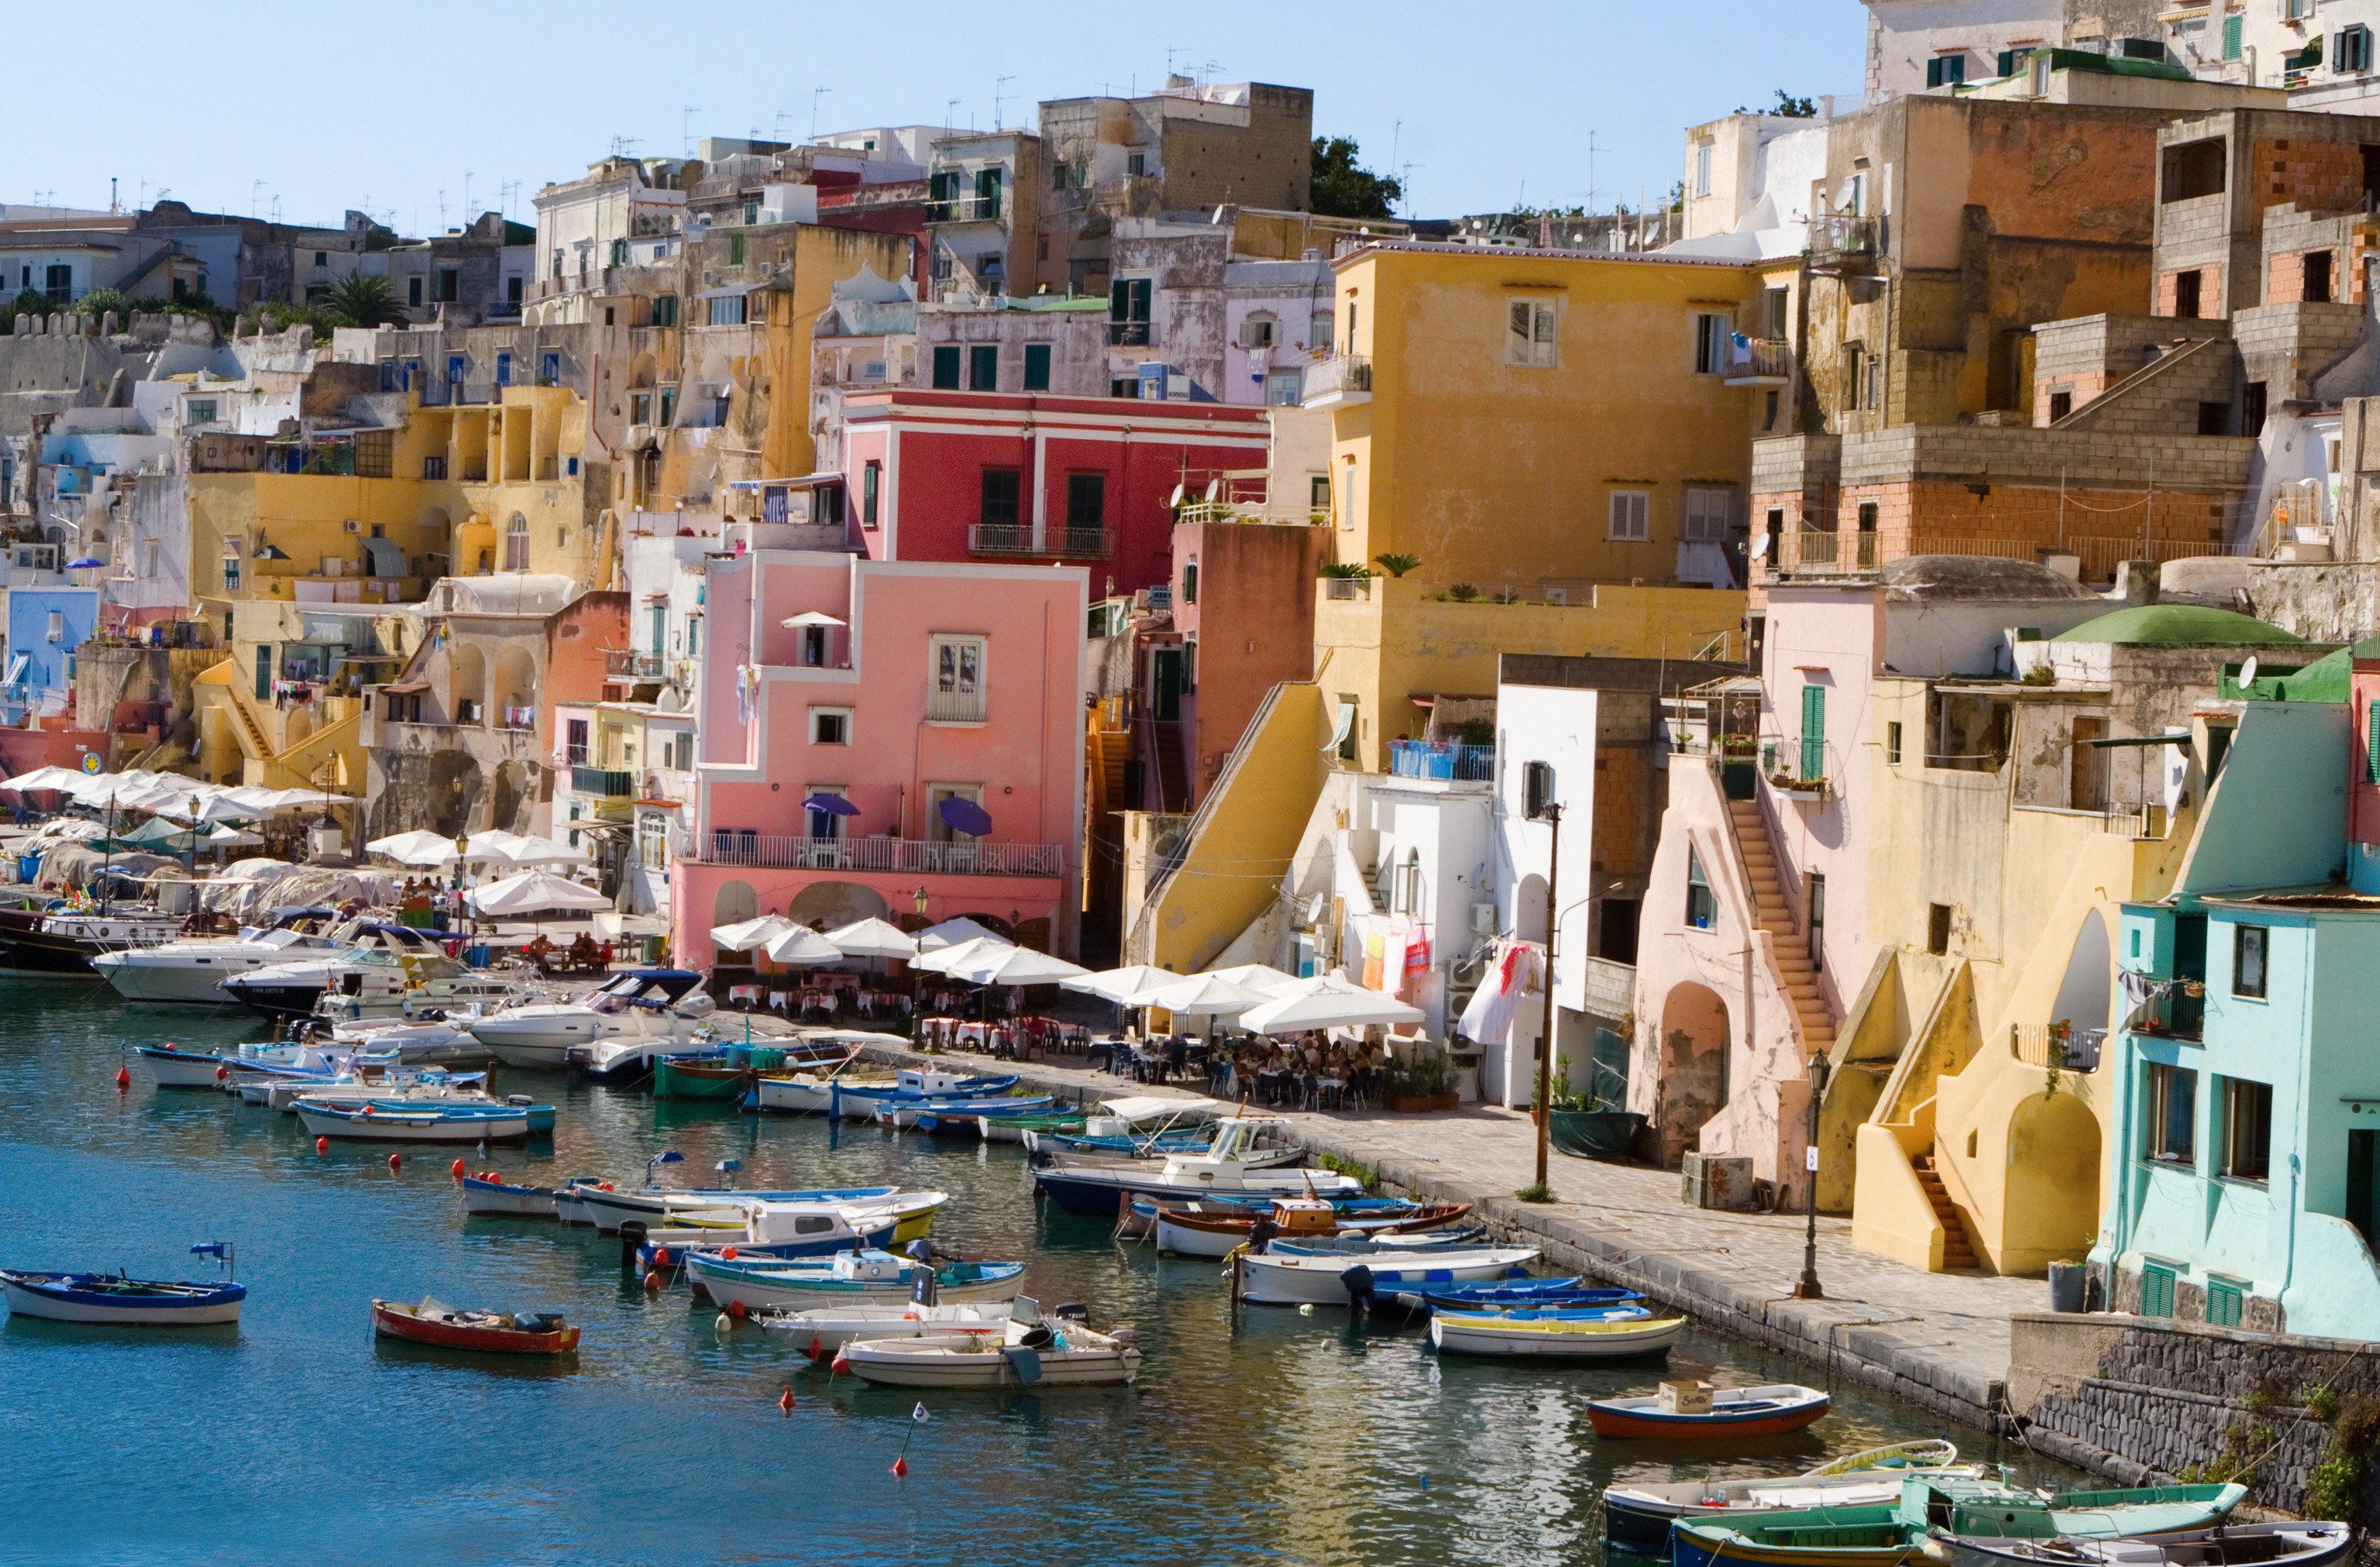 Romance Trip Ideas water Harbor outdoor scene Town City marina port watercraft water transportation Boat tourism sky slum several